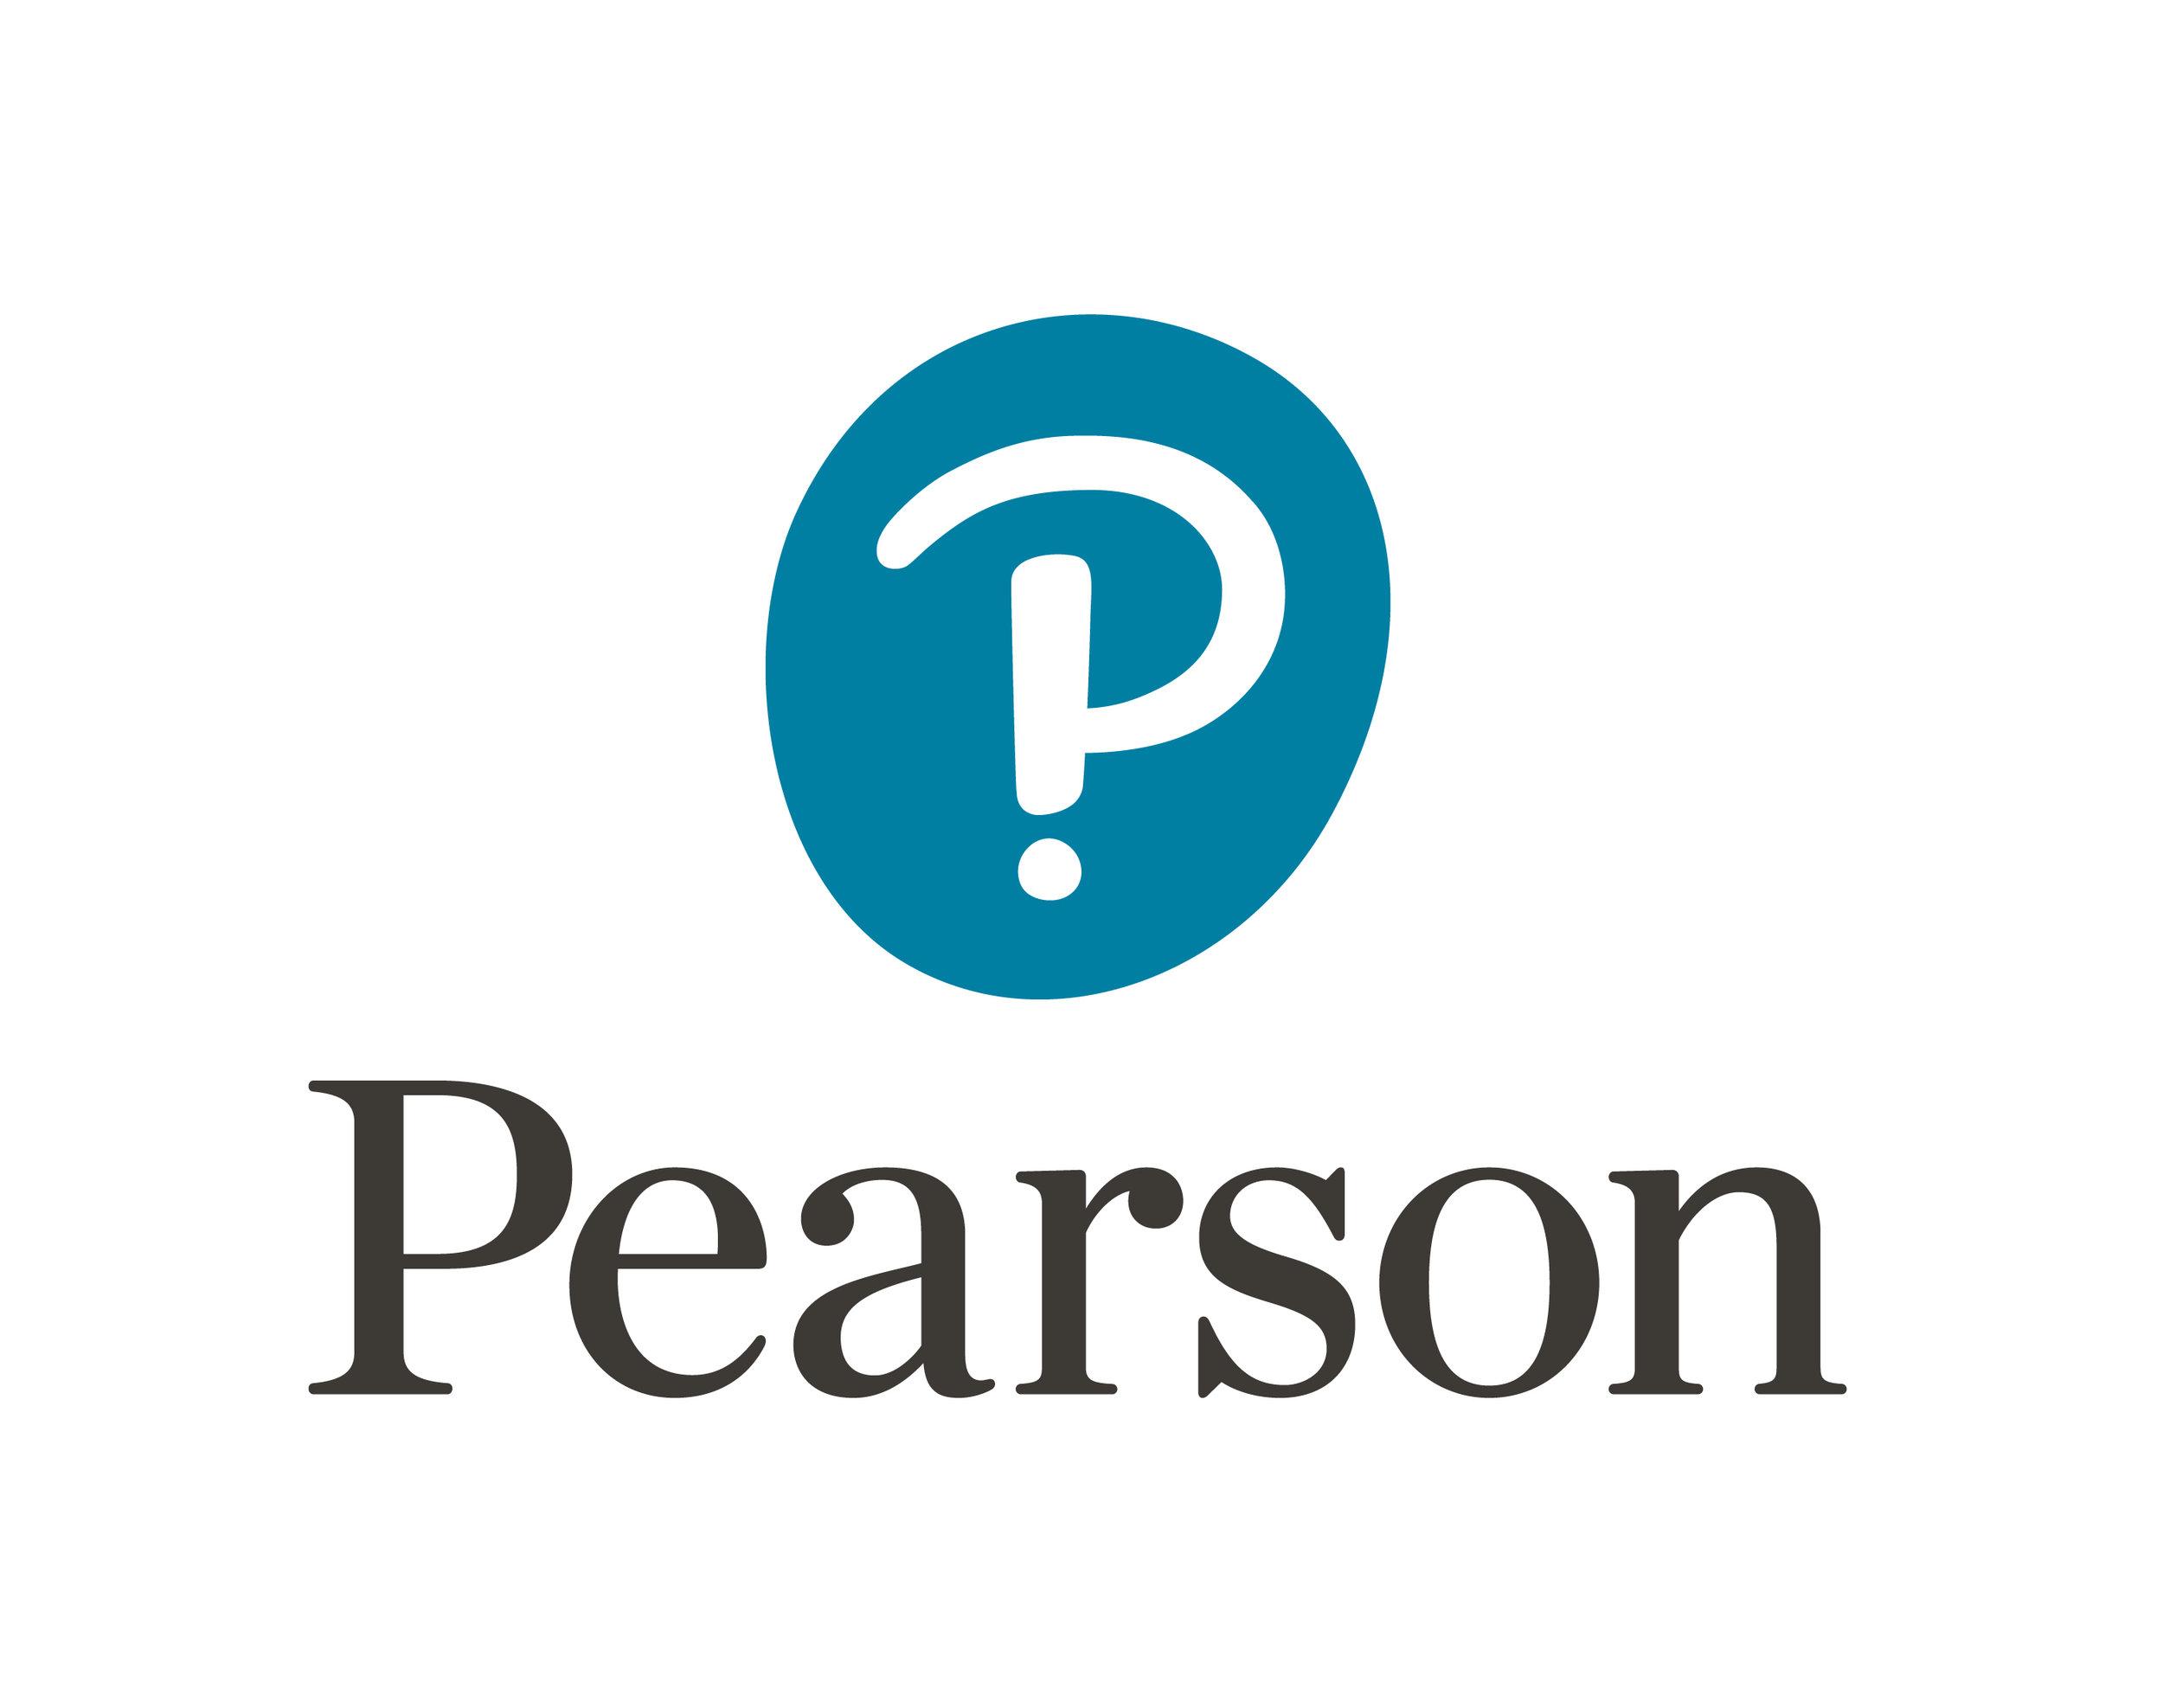 PearsonLogo_Primary_Blk_RGB.jpg